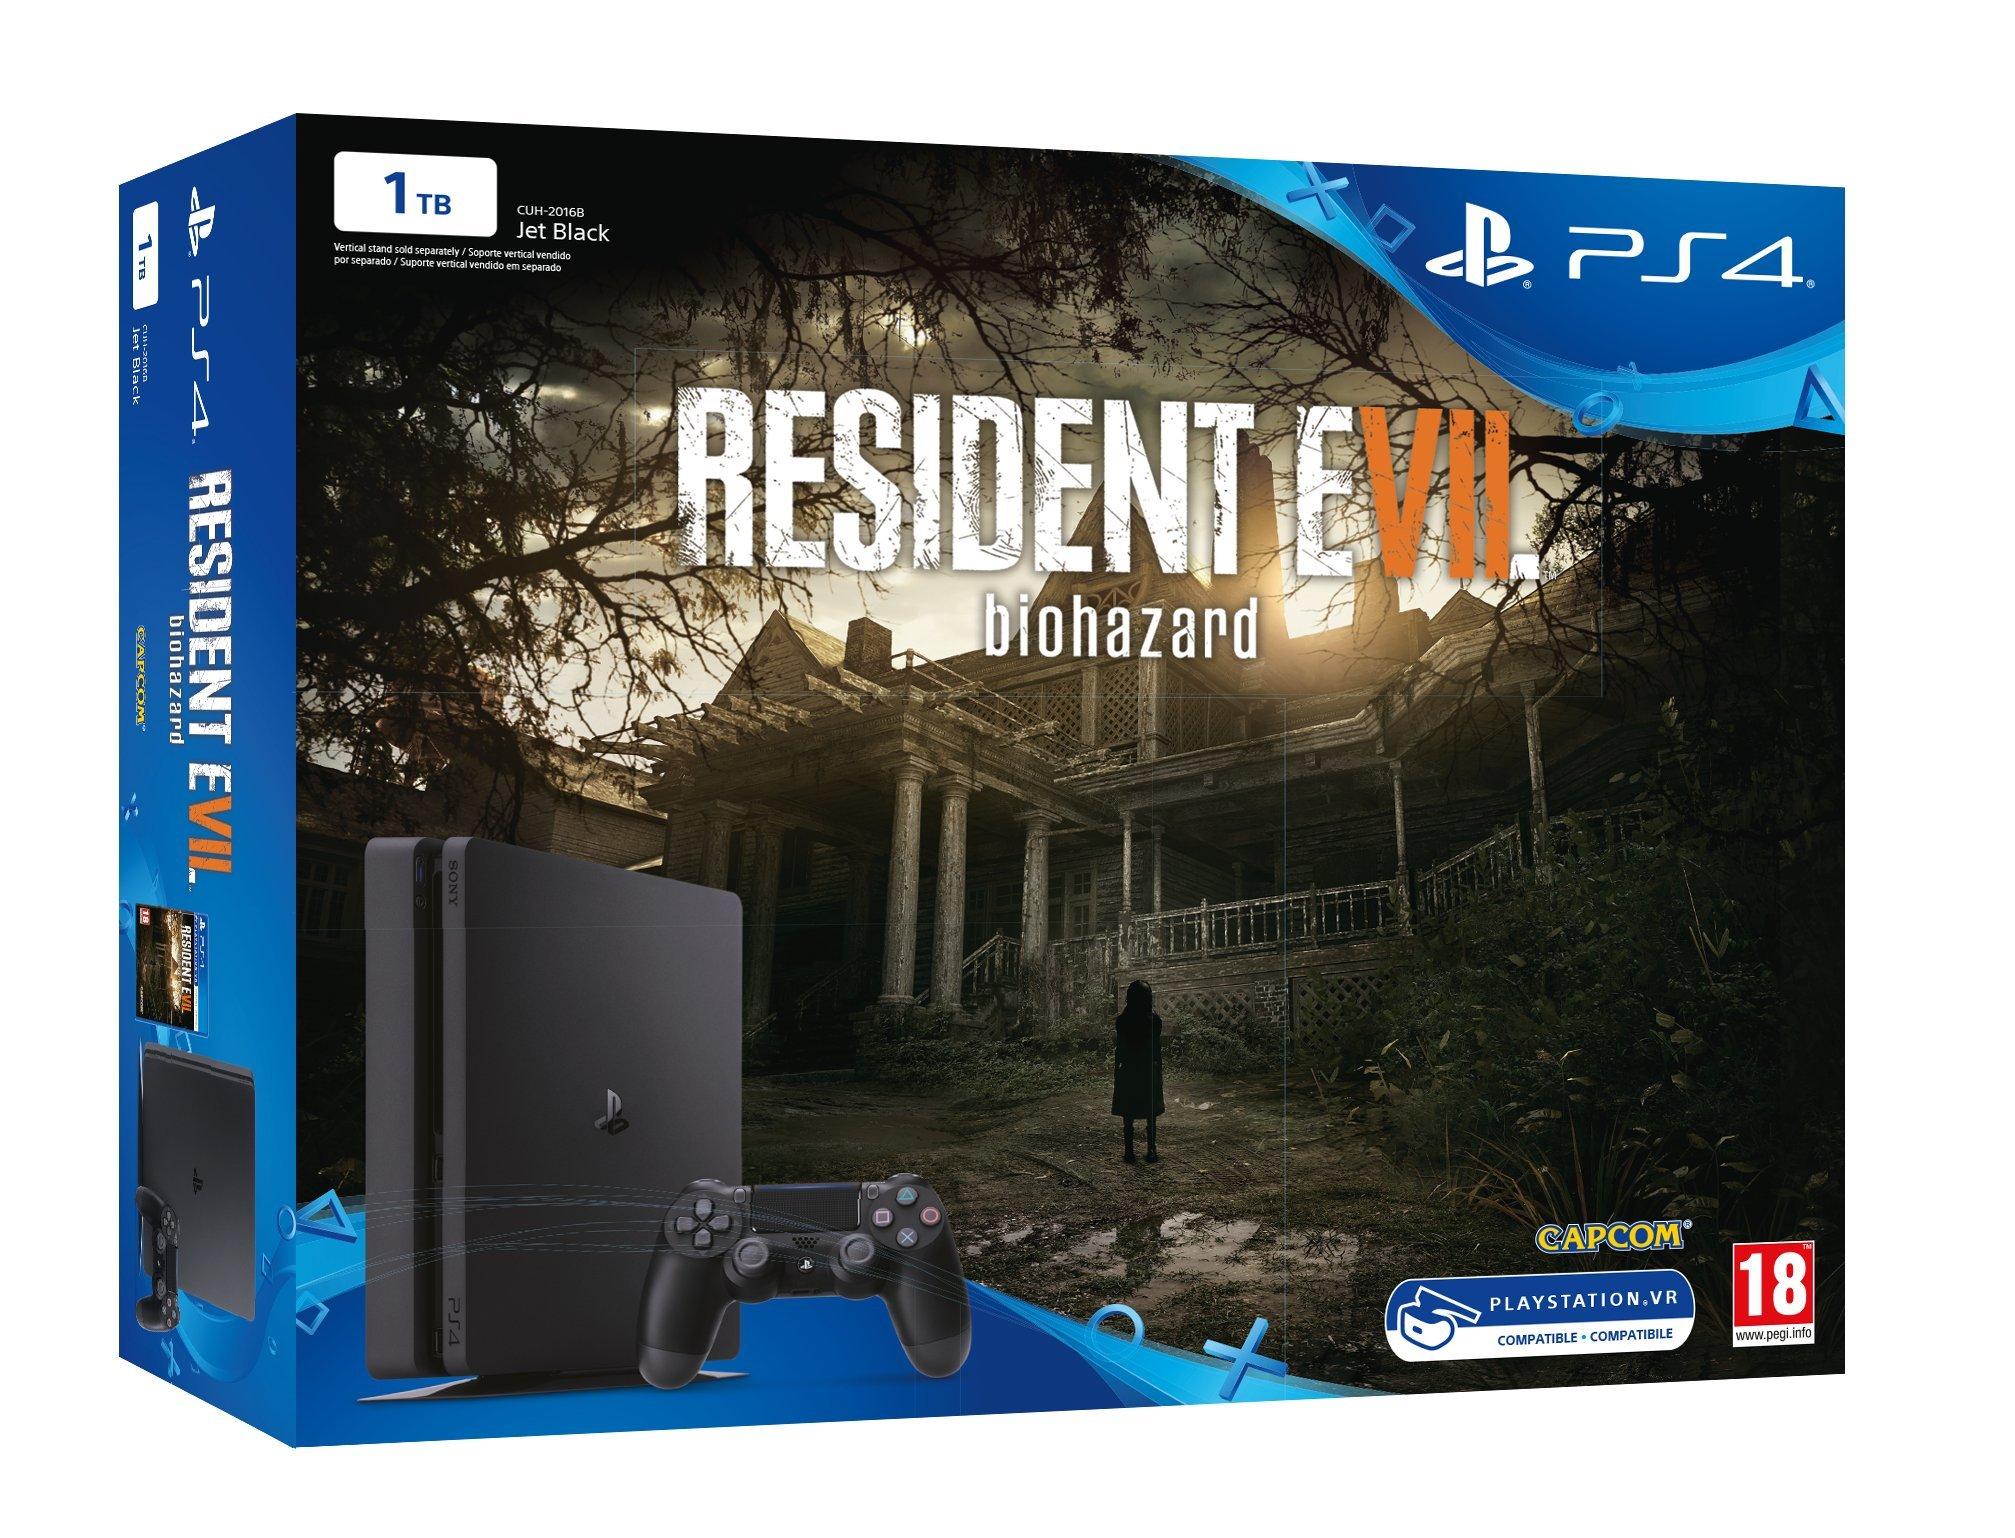 PlayStation 4 Slim (PS4) 1TB - Consola + Resident Evil VII: Amazon ...